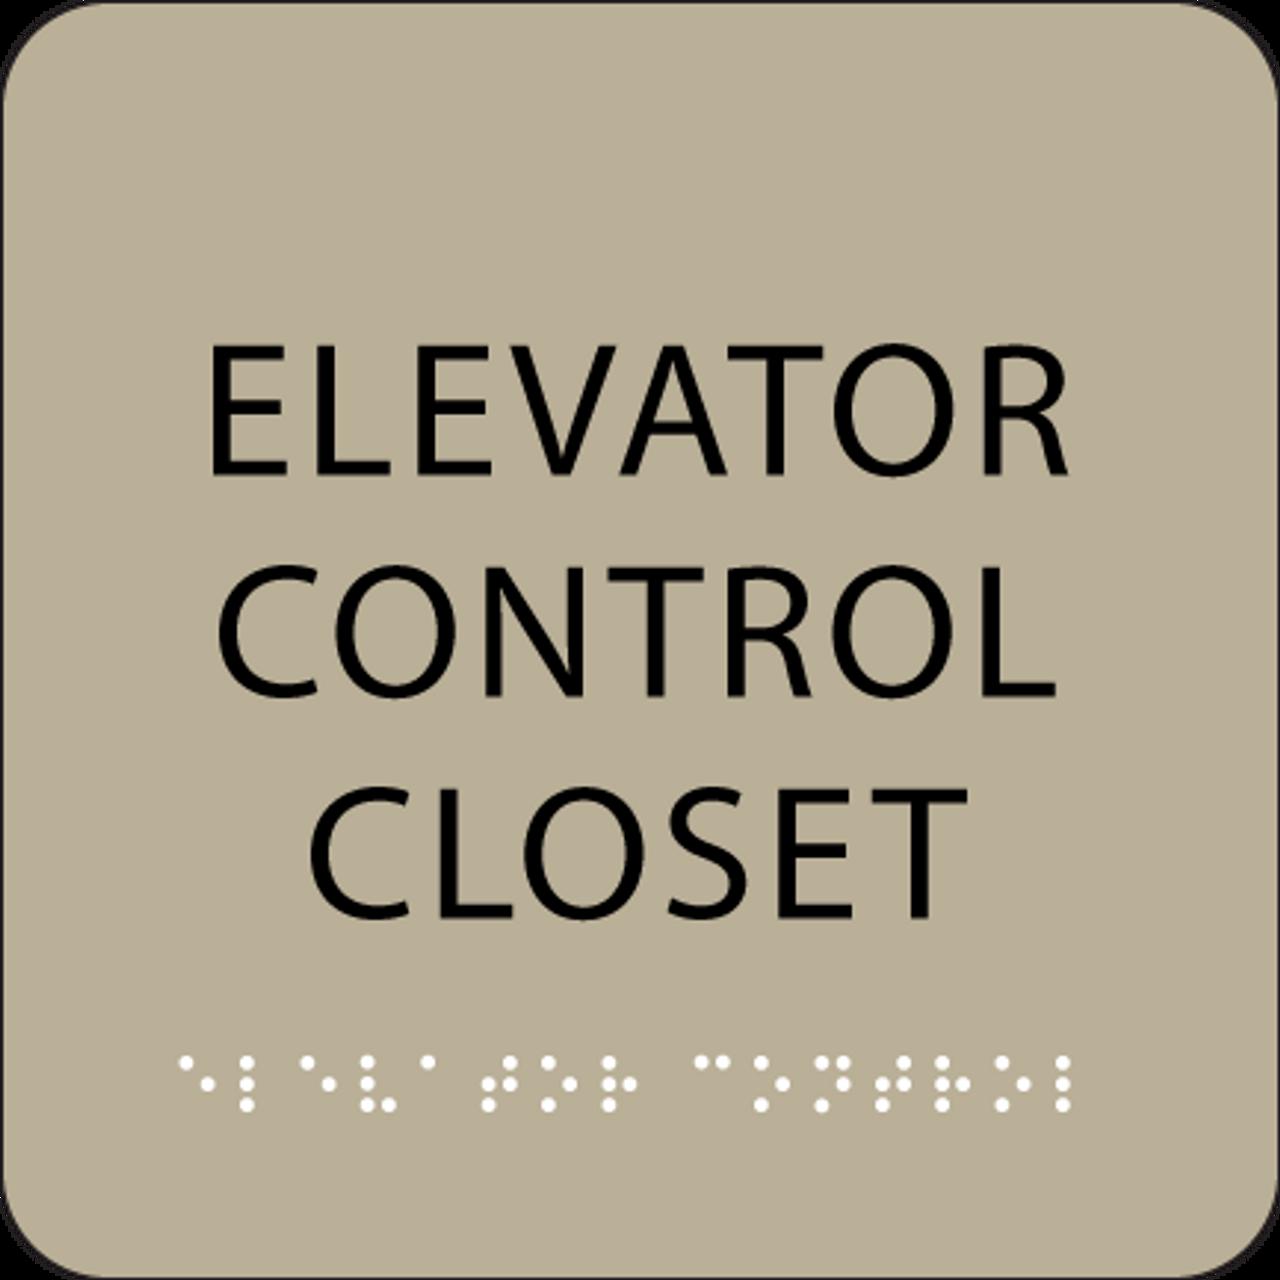 Brown Elevator Control Closet ADA Sign